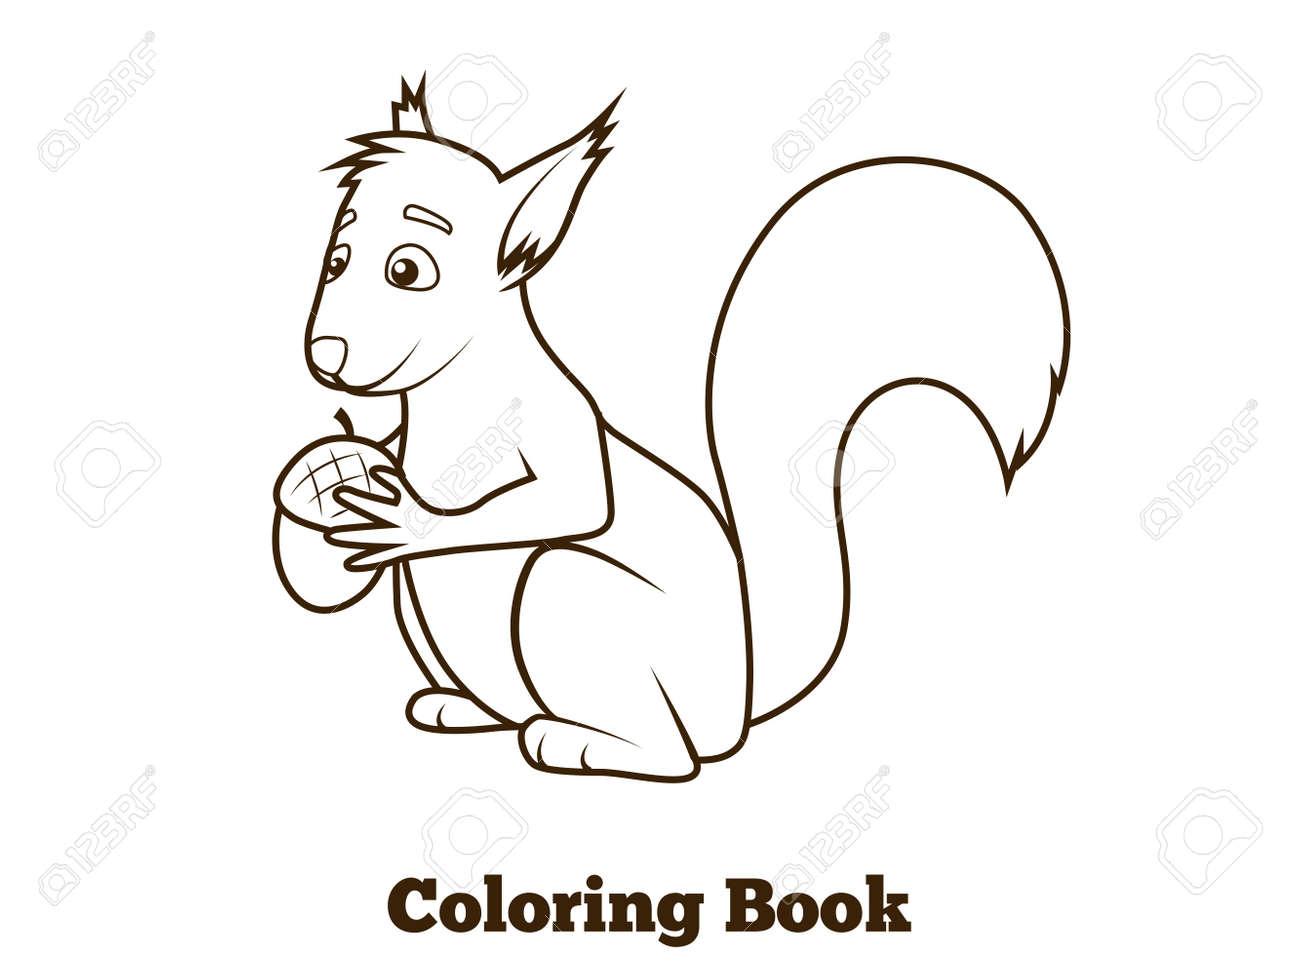 Dibujos Ardillas Para Colorear. Dibujo De Jeanette La Ardilla Para ...